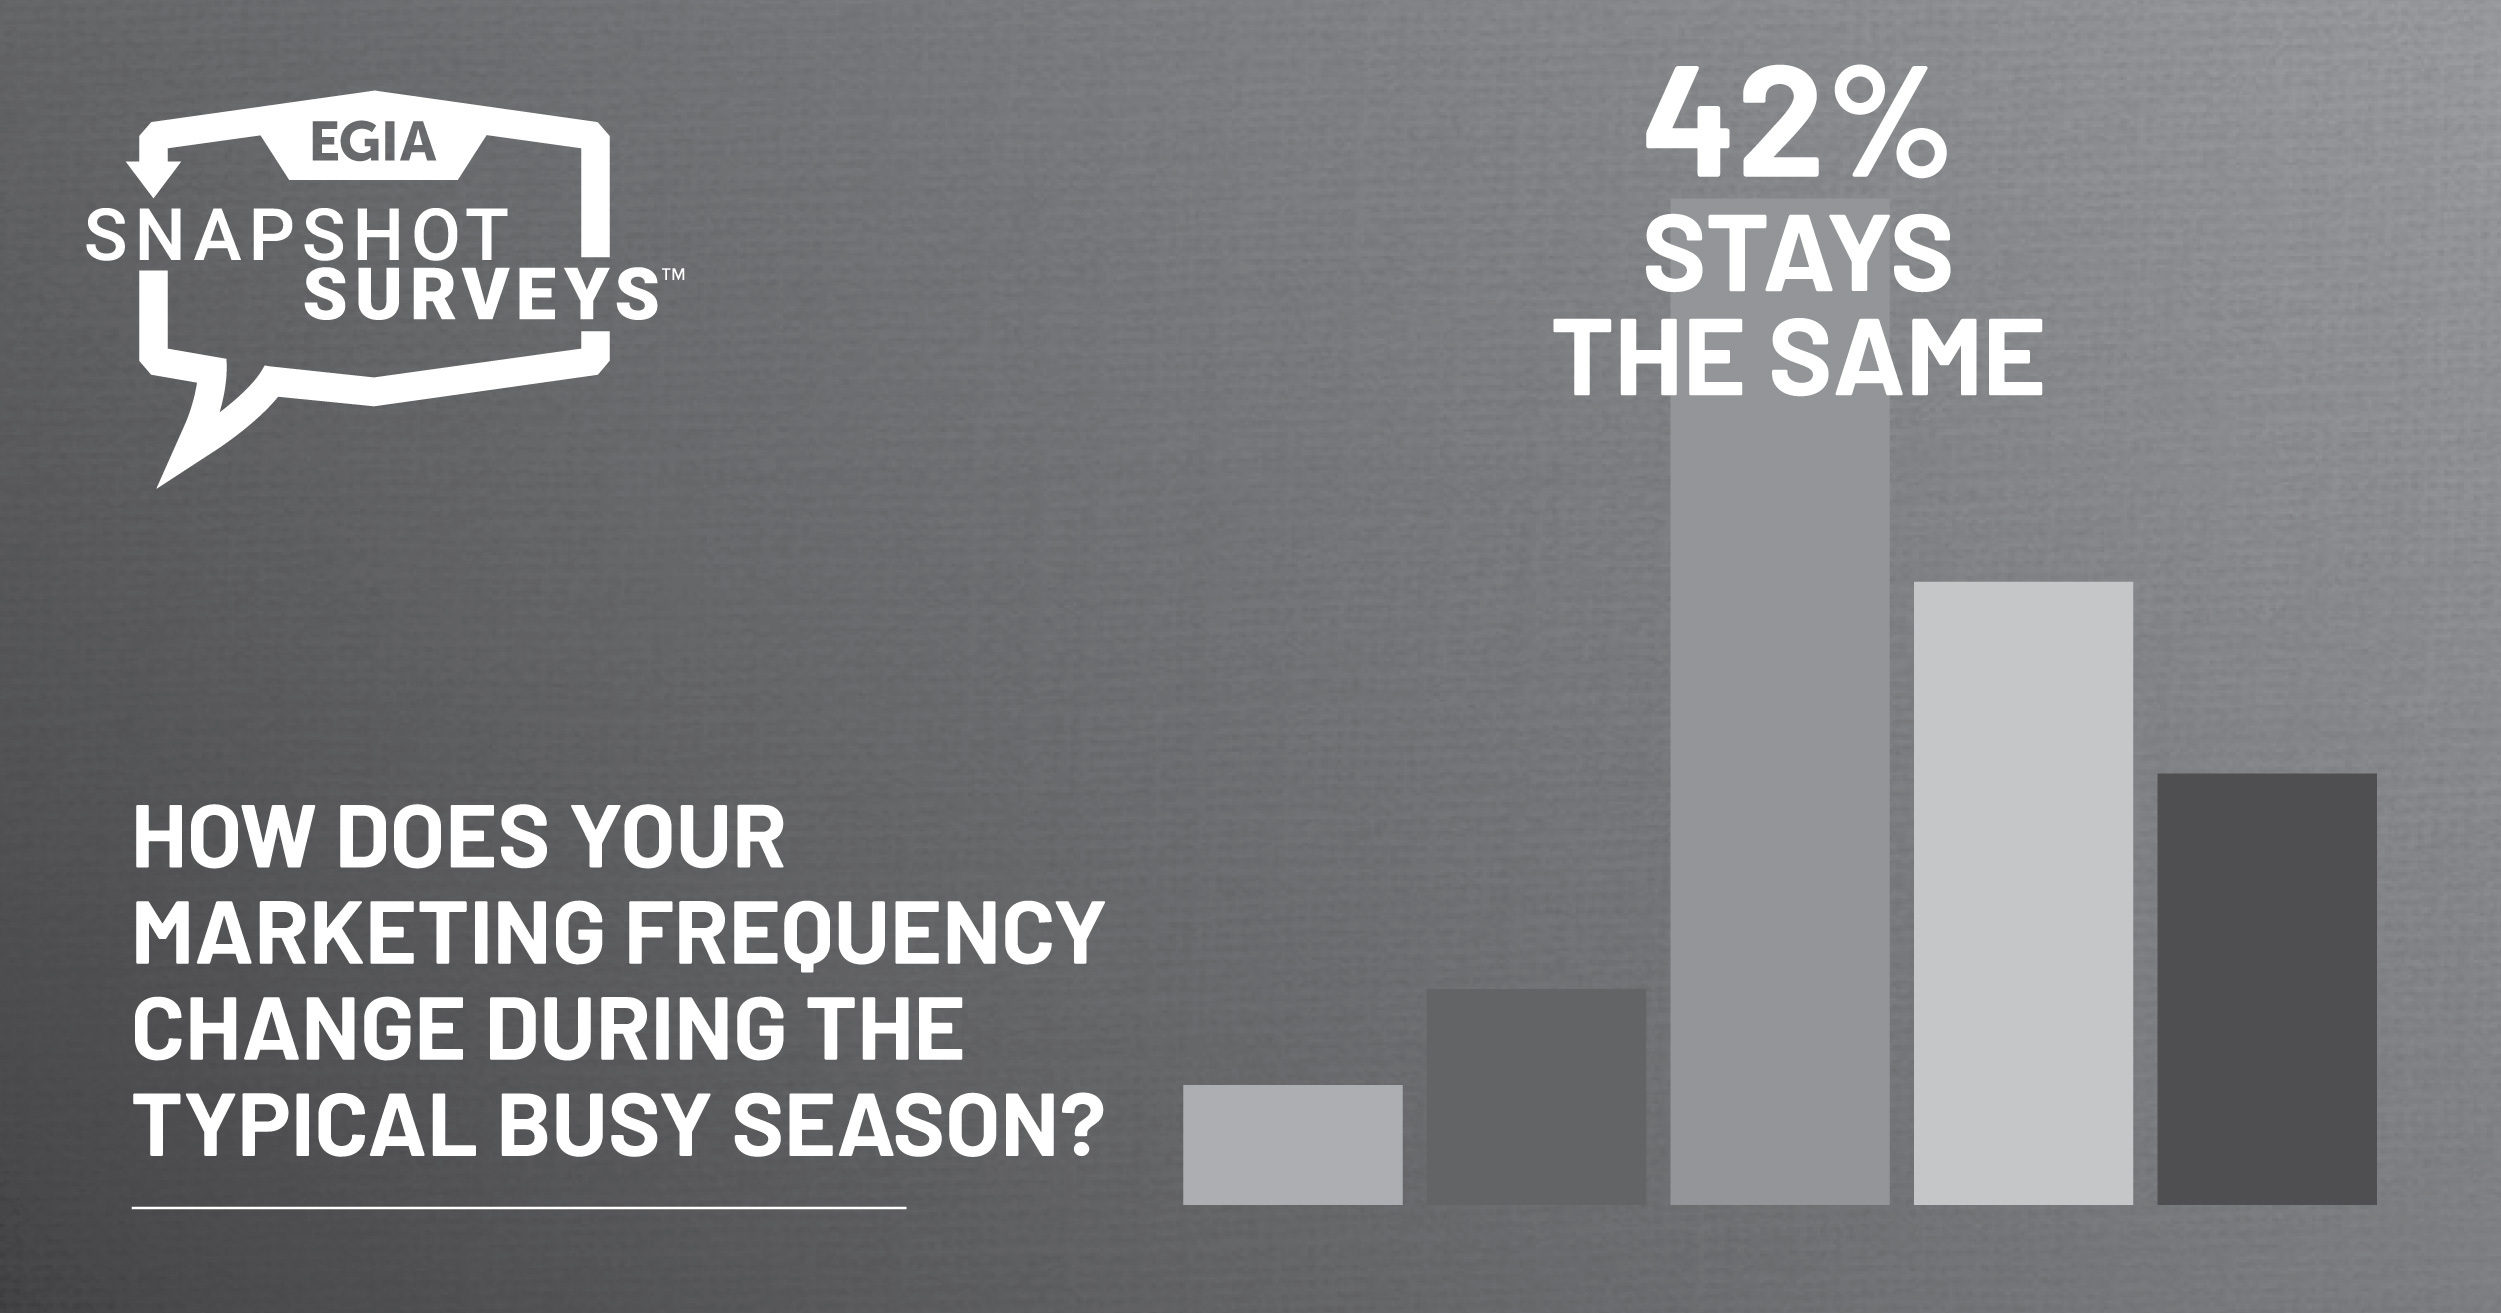 EGIA Snapshot Survey - Busy Season Marketing Promotions